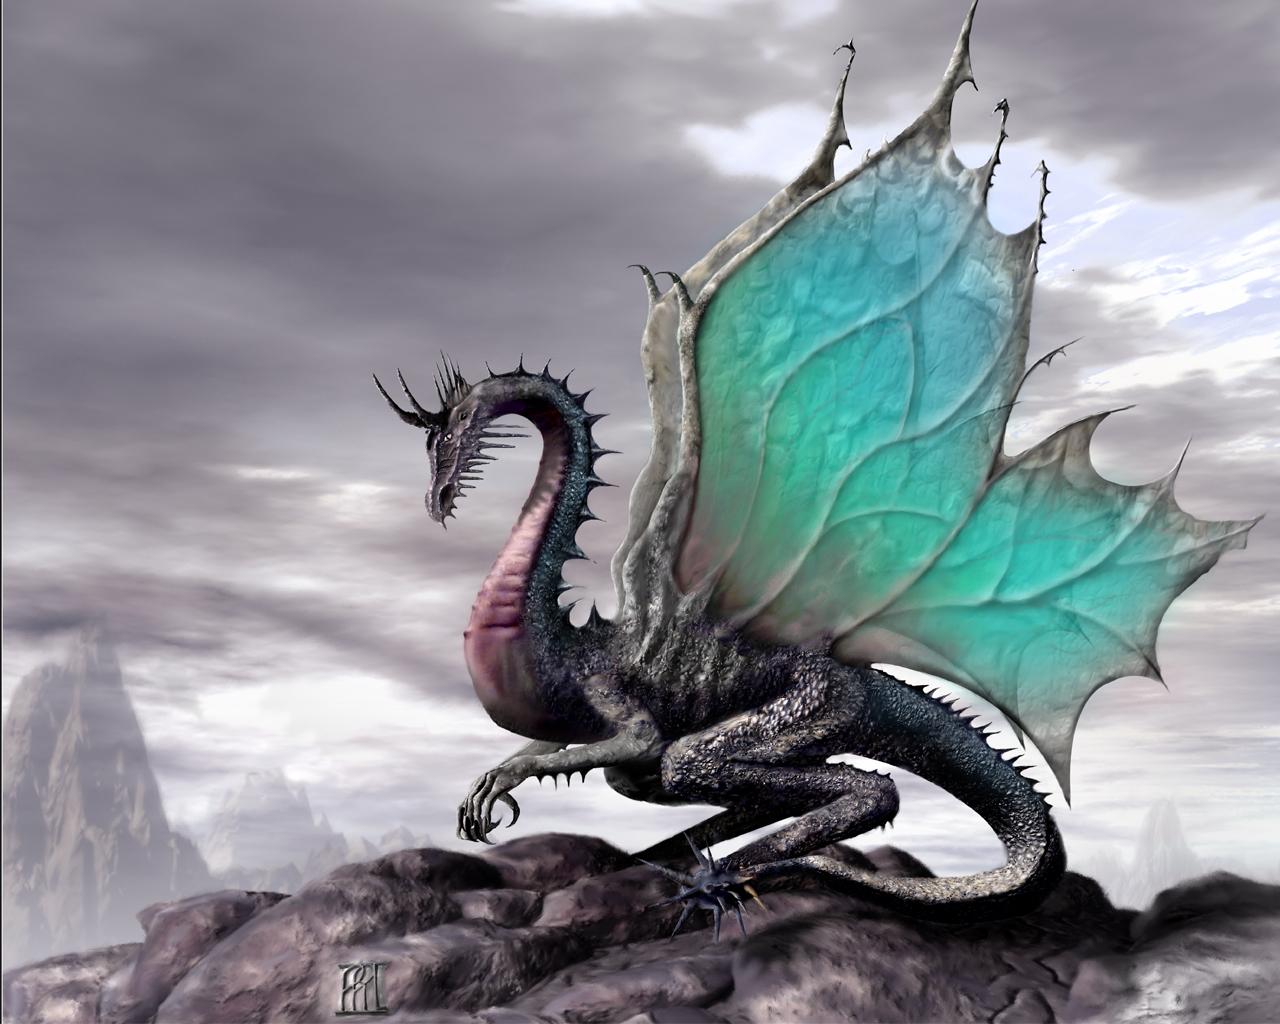 http://2.bp.blogspot.com/_IajCxVonVZY/TUWBEKFkBGI/AAAAAAAAAQI/vpTsT80qAH4/s1600/dragon-ailes-21980854f6.jpg